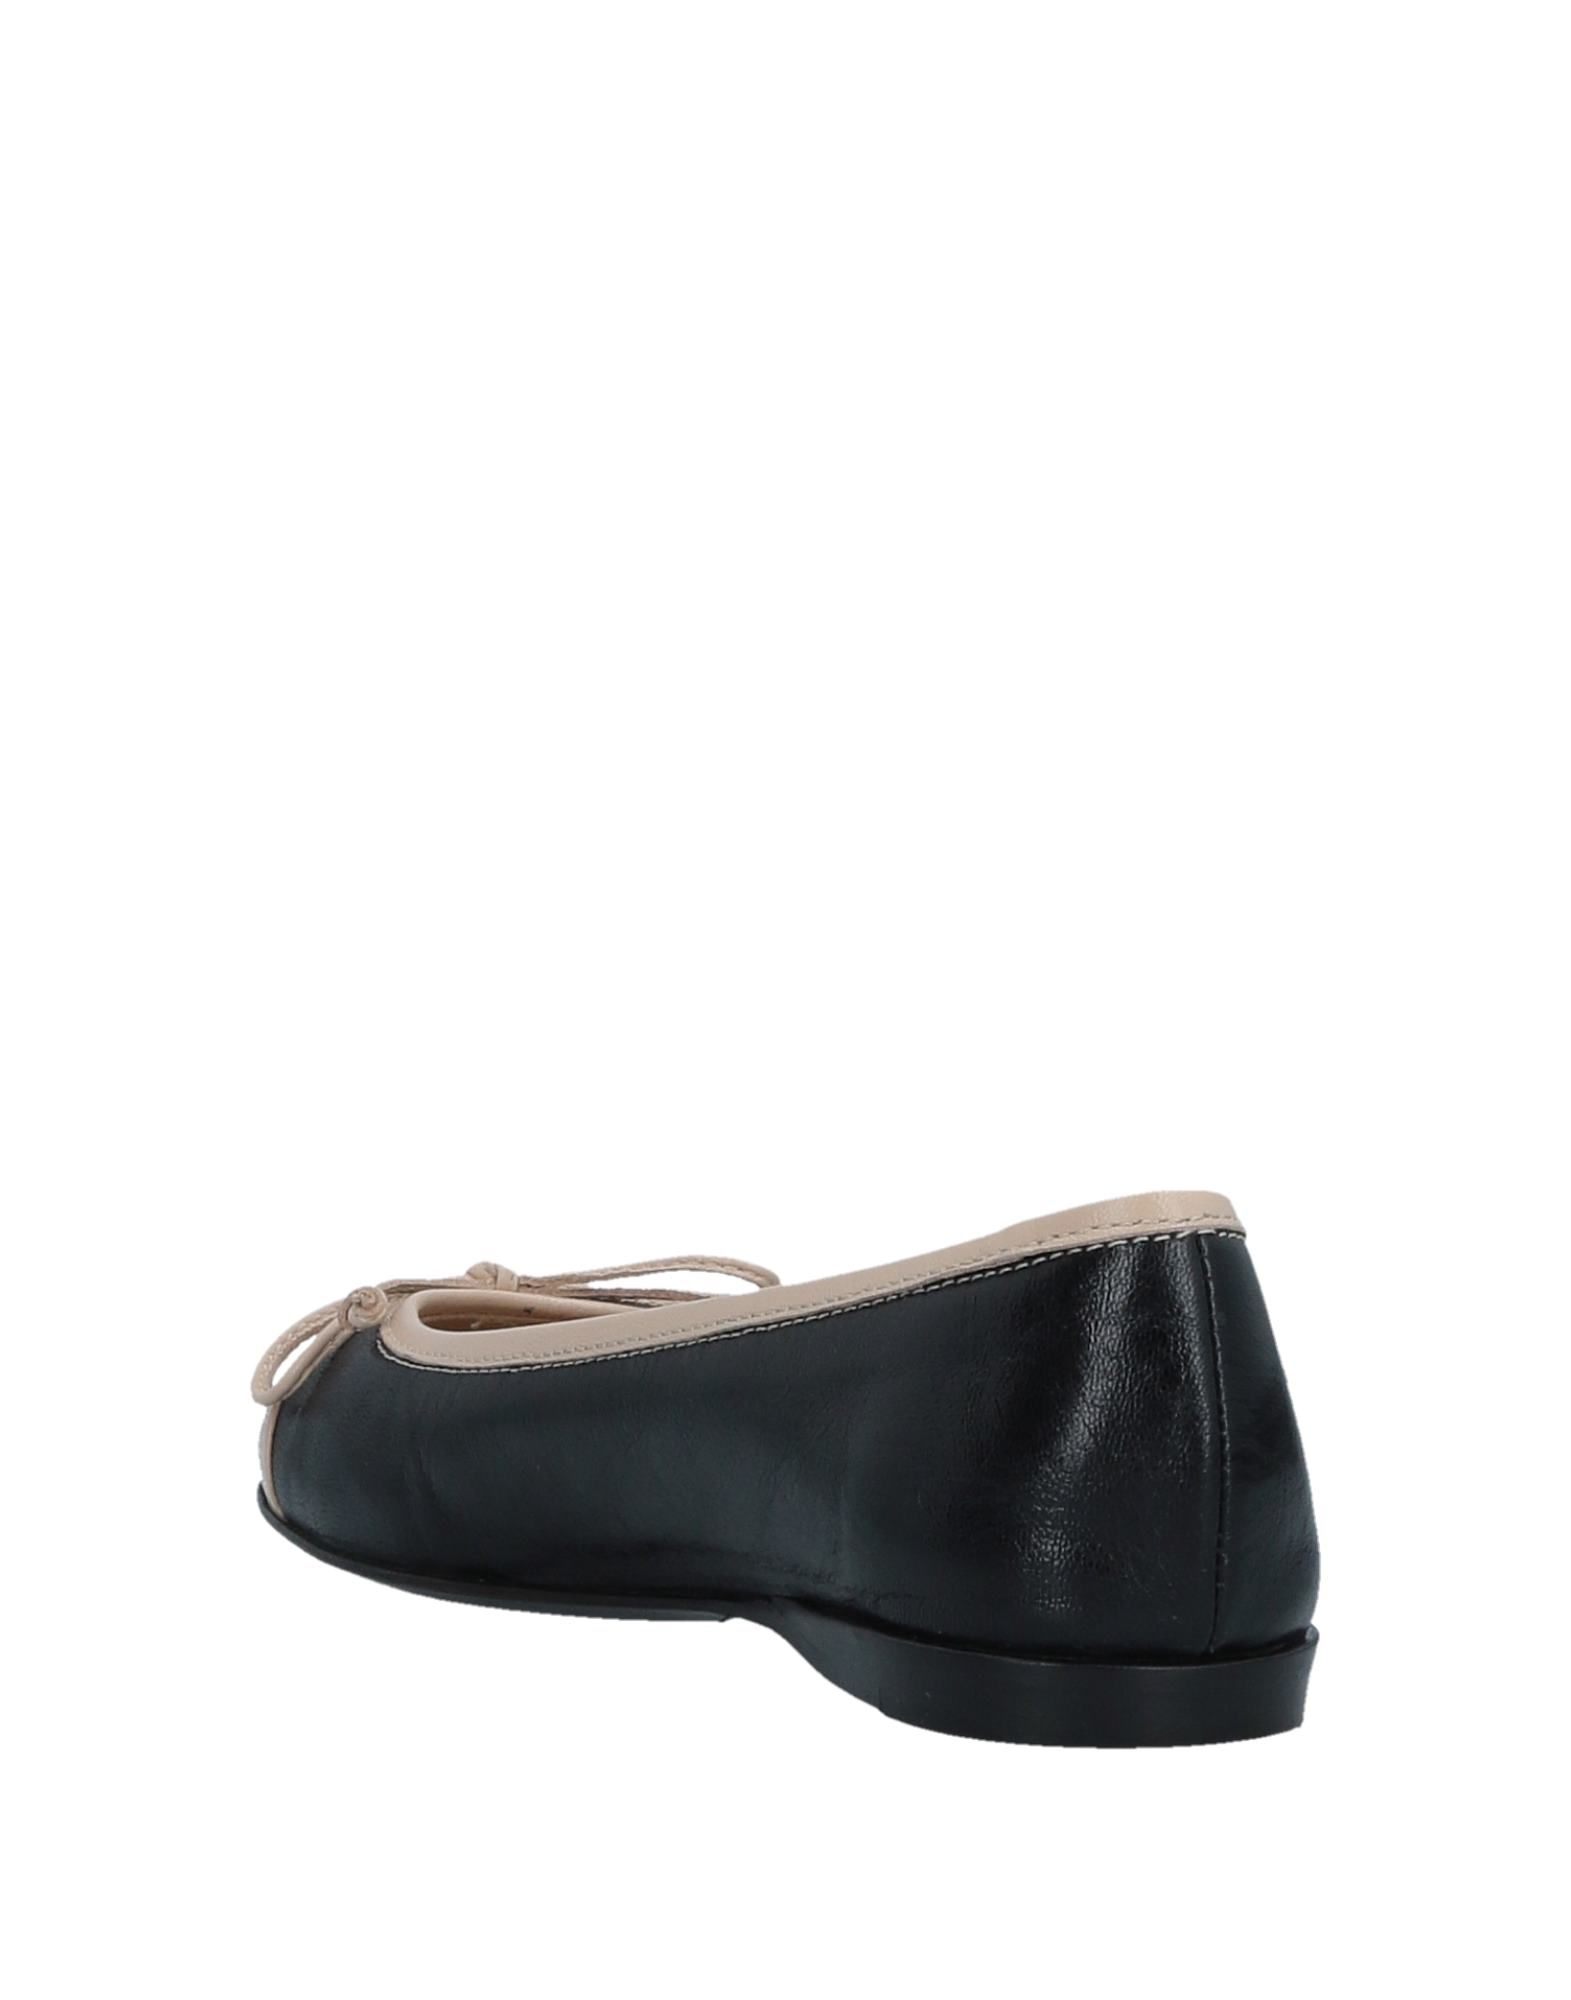 Betti Oliva Ballerinas Damen  11521951QU 11521951QU 11521951QU Gute Qualität beliebte Schuhe 13126f